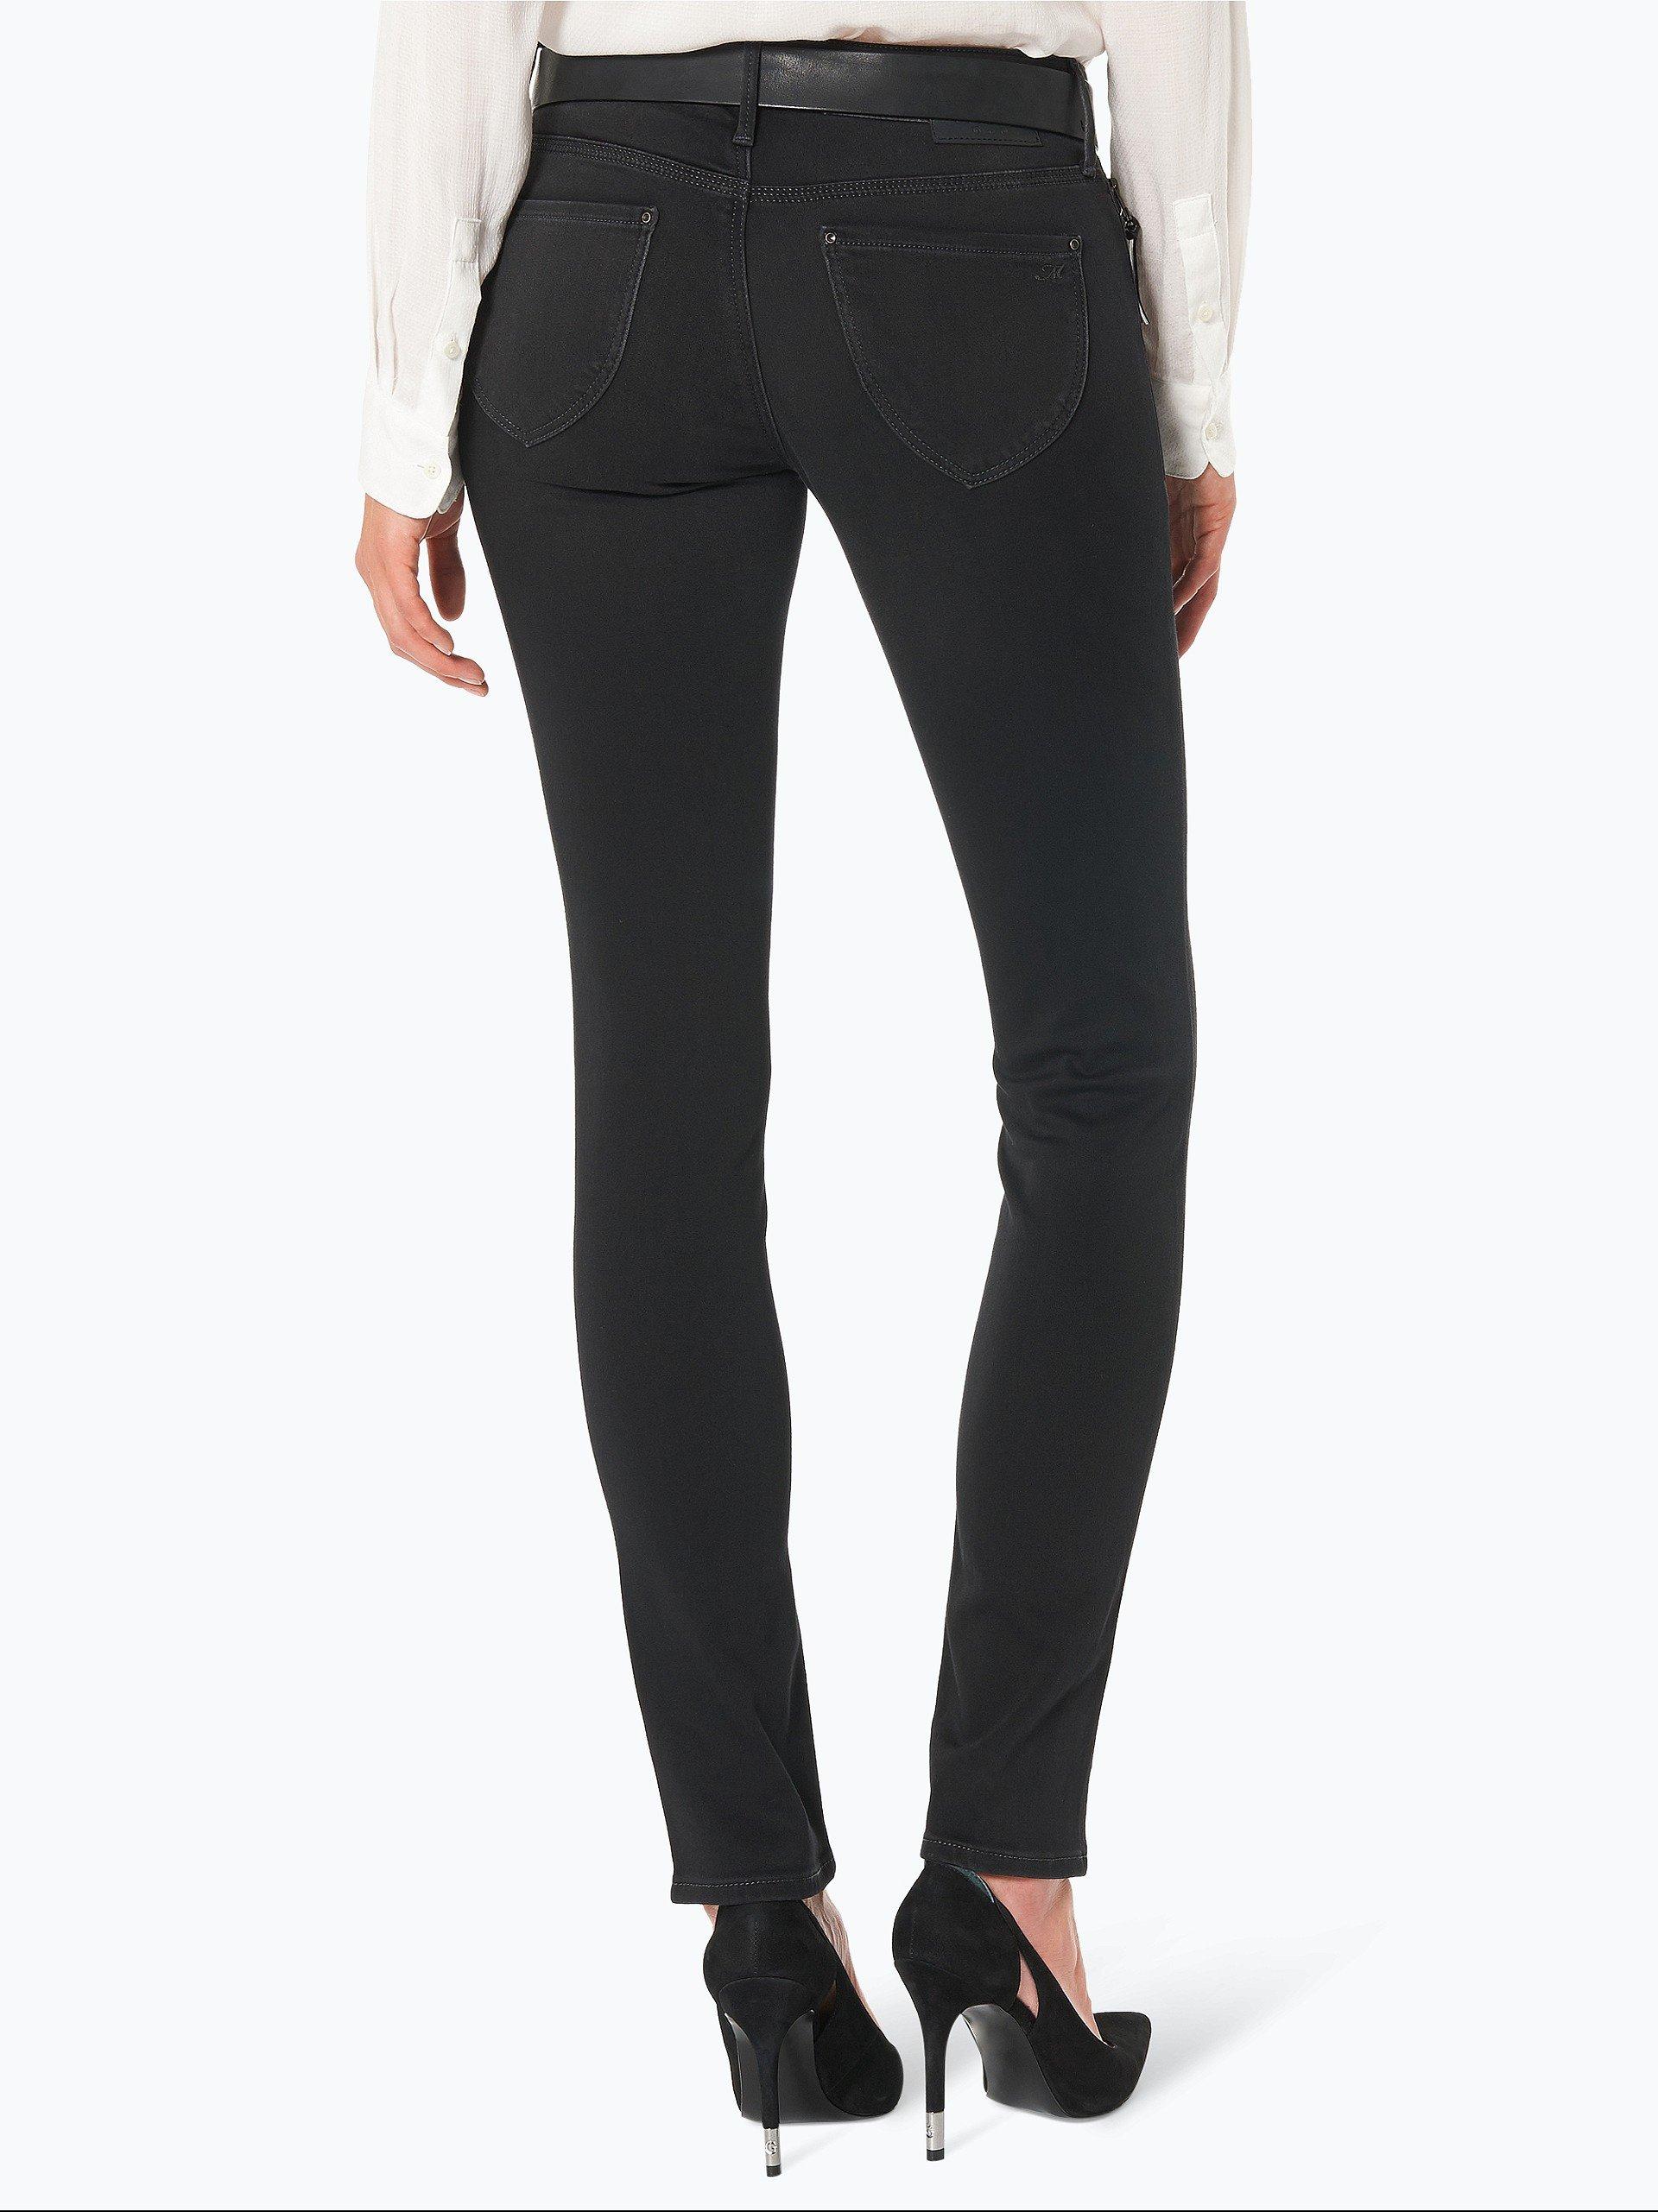 a14ed237859a Mavi Damen Jeans - Sophie  2  online kaufen   PEEK-UND-CLOPPENBURG.DE